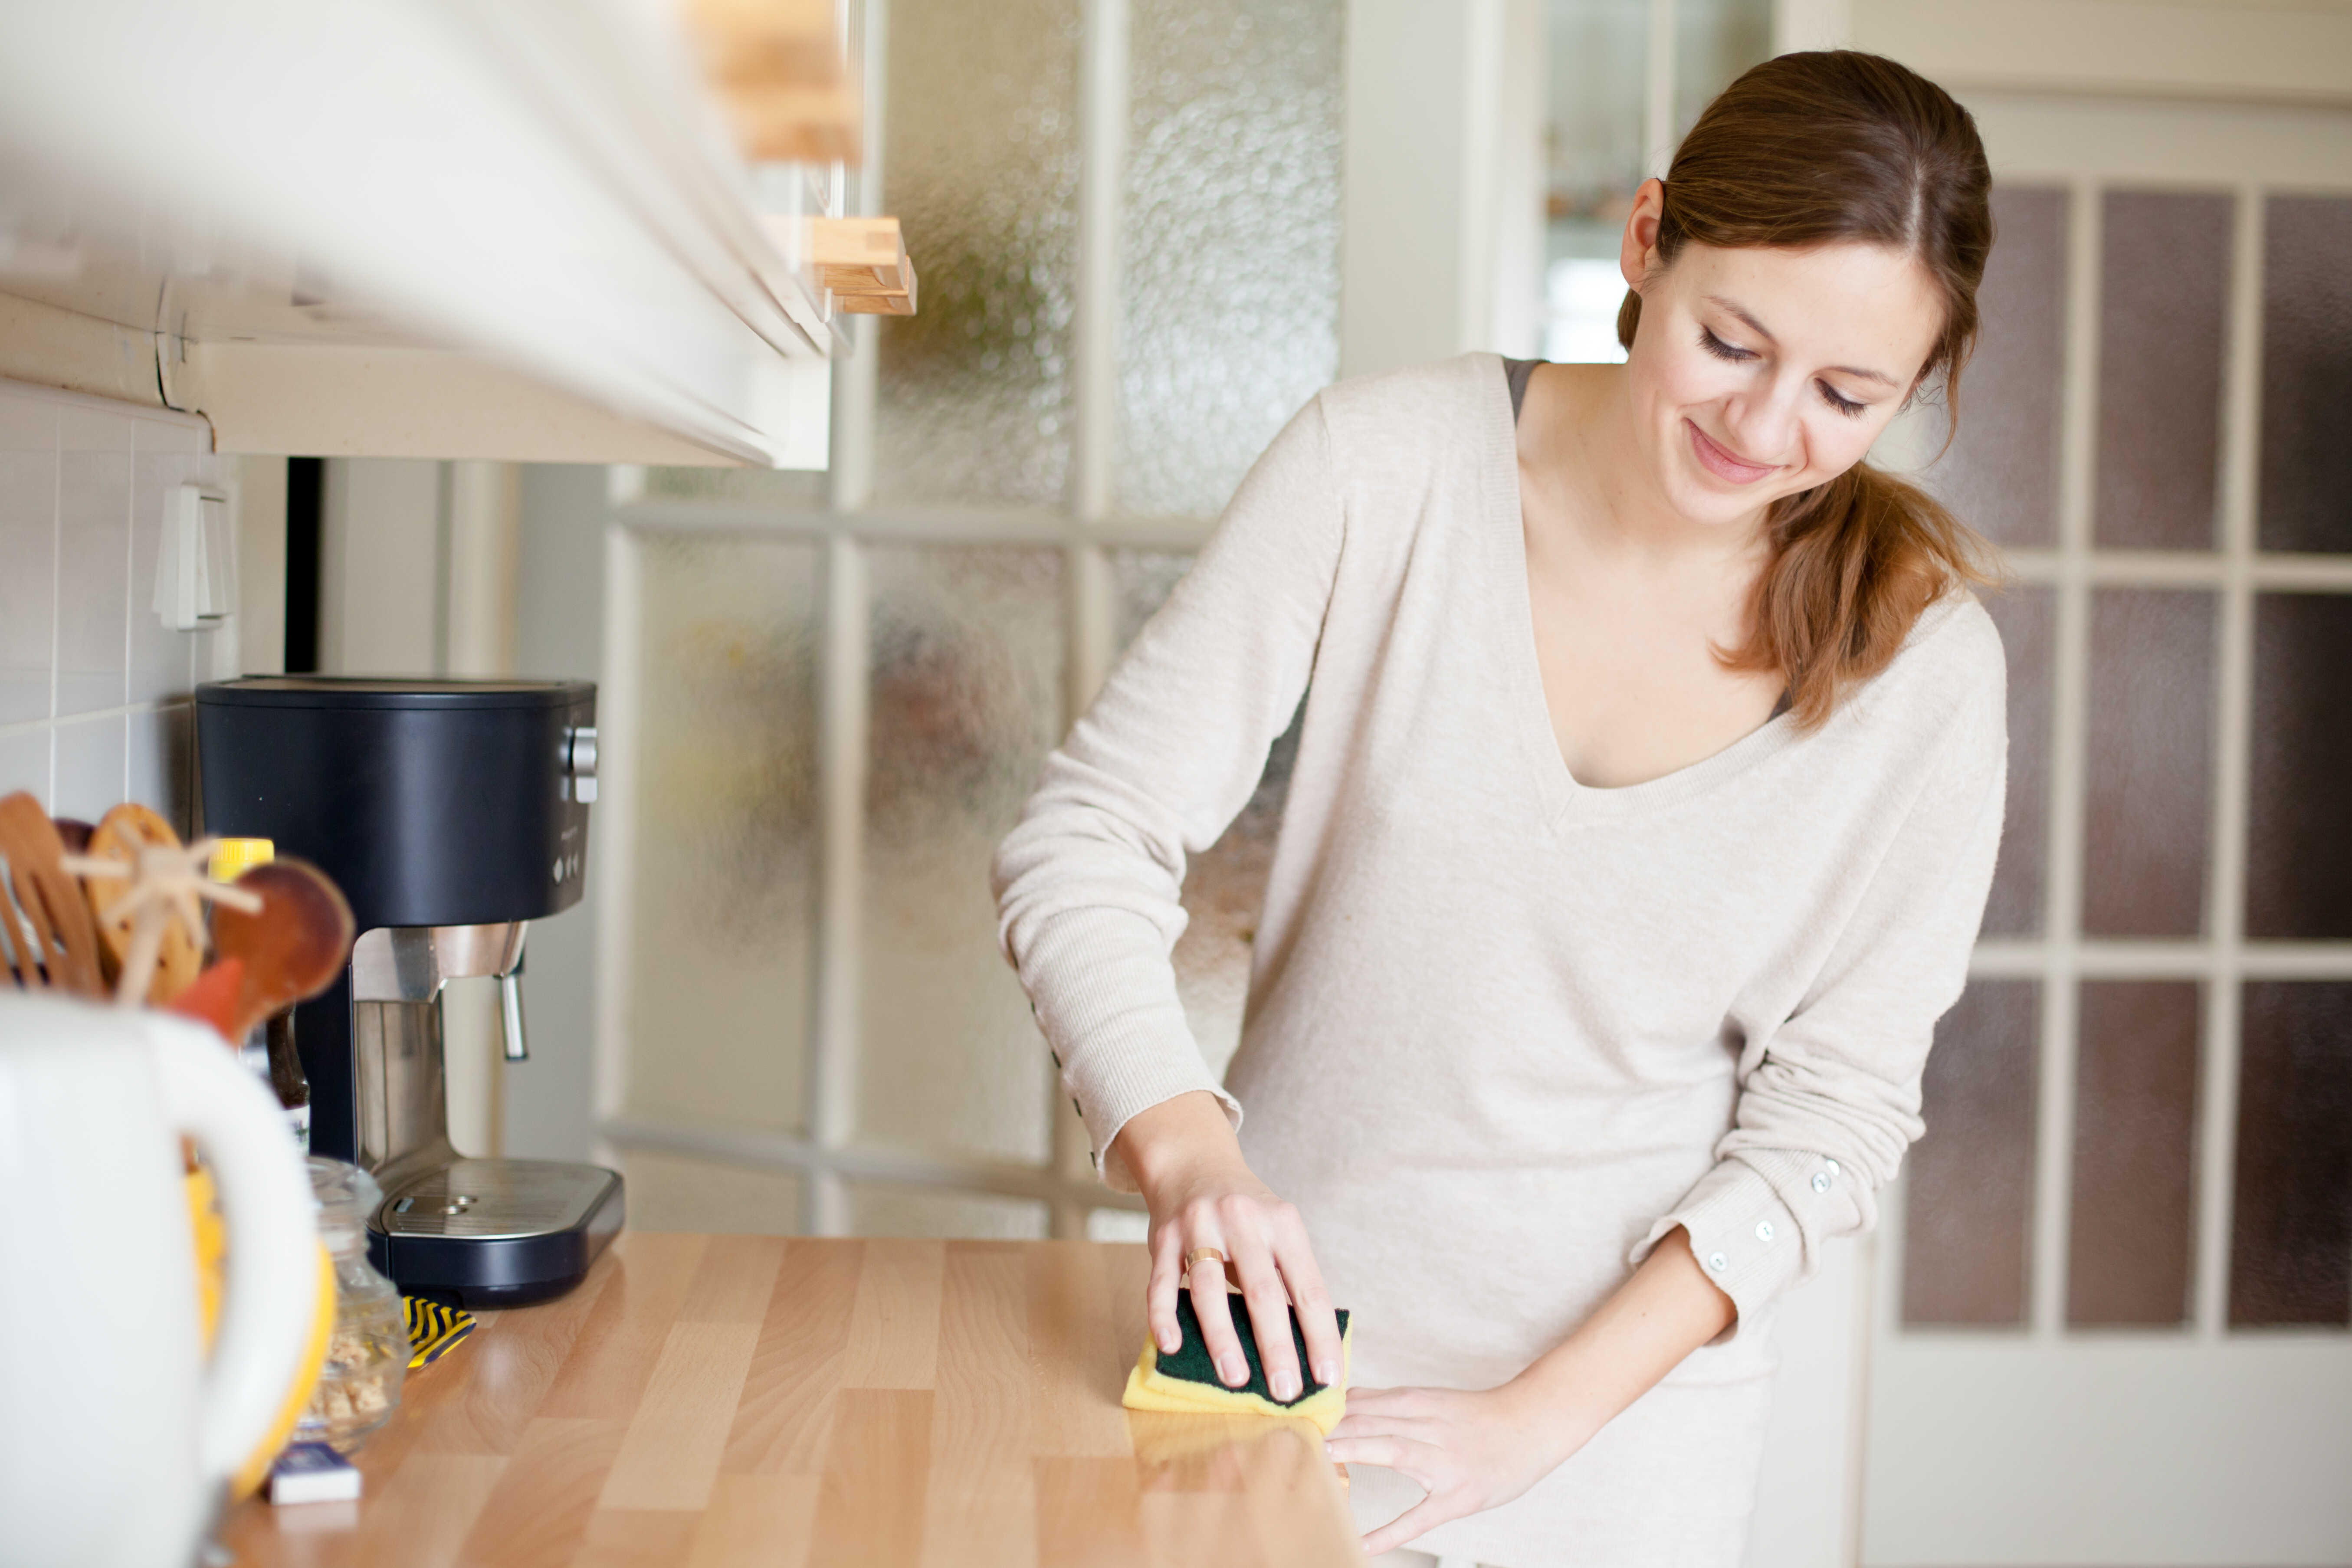 Woman wiping a countertop